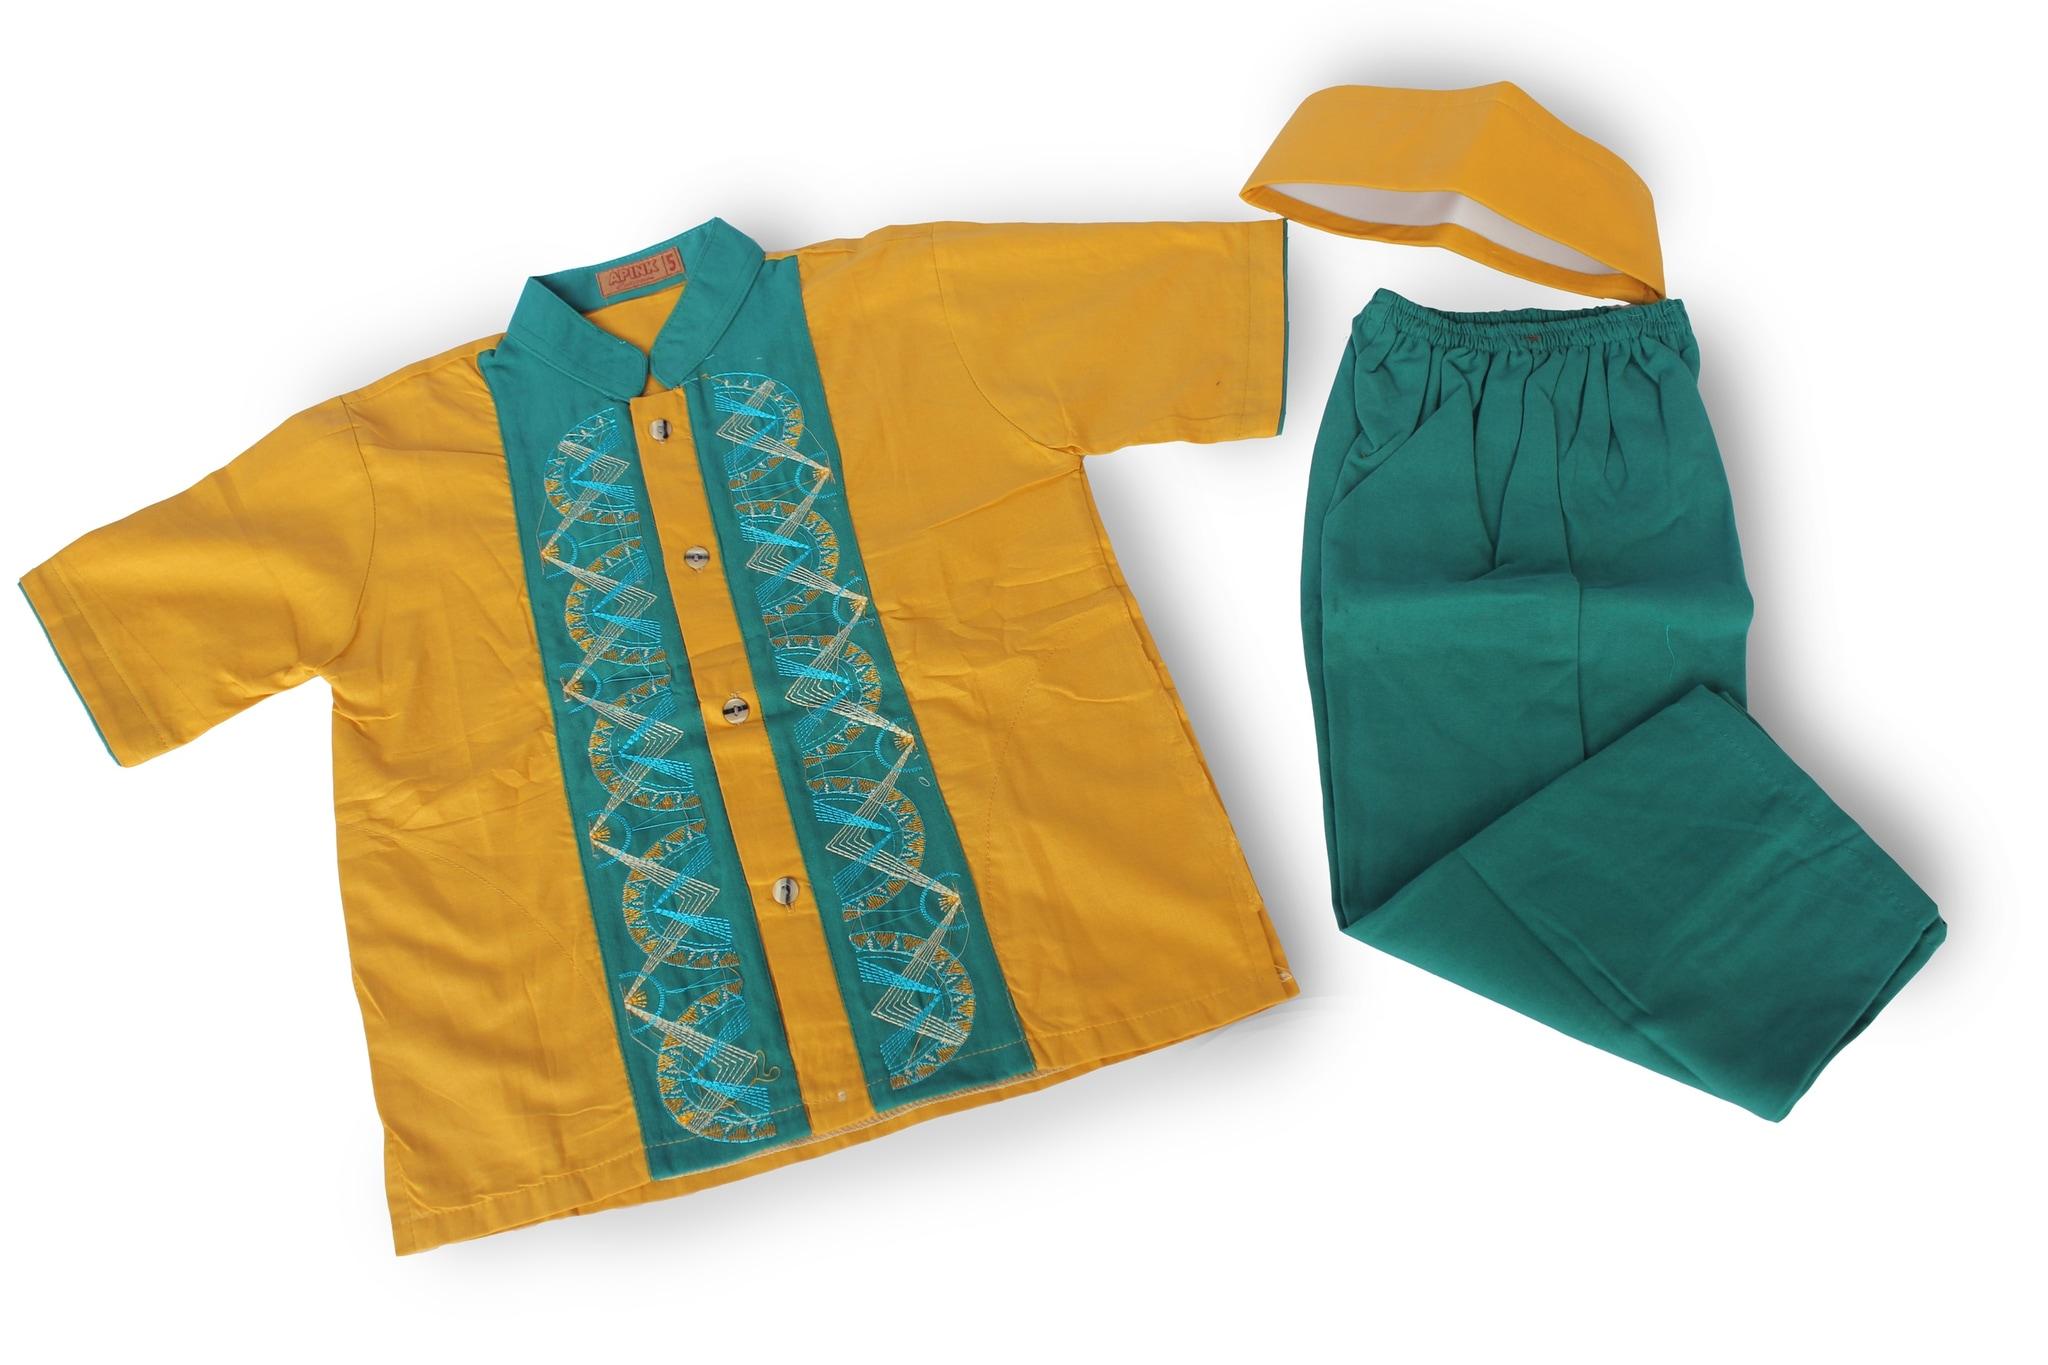 Setelan Baju Koko Anak Laki Laki Terbaru - KOKO D (3-4 tahun)